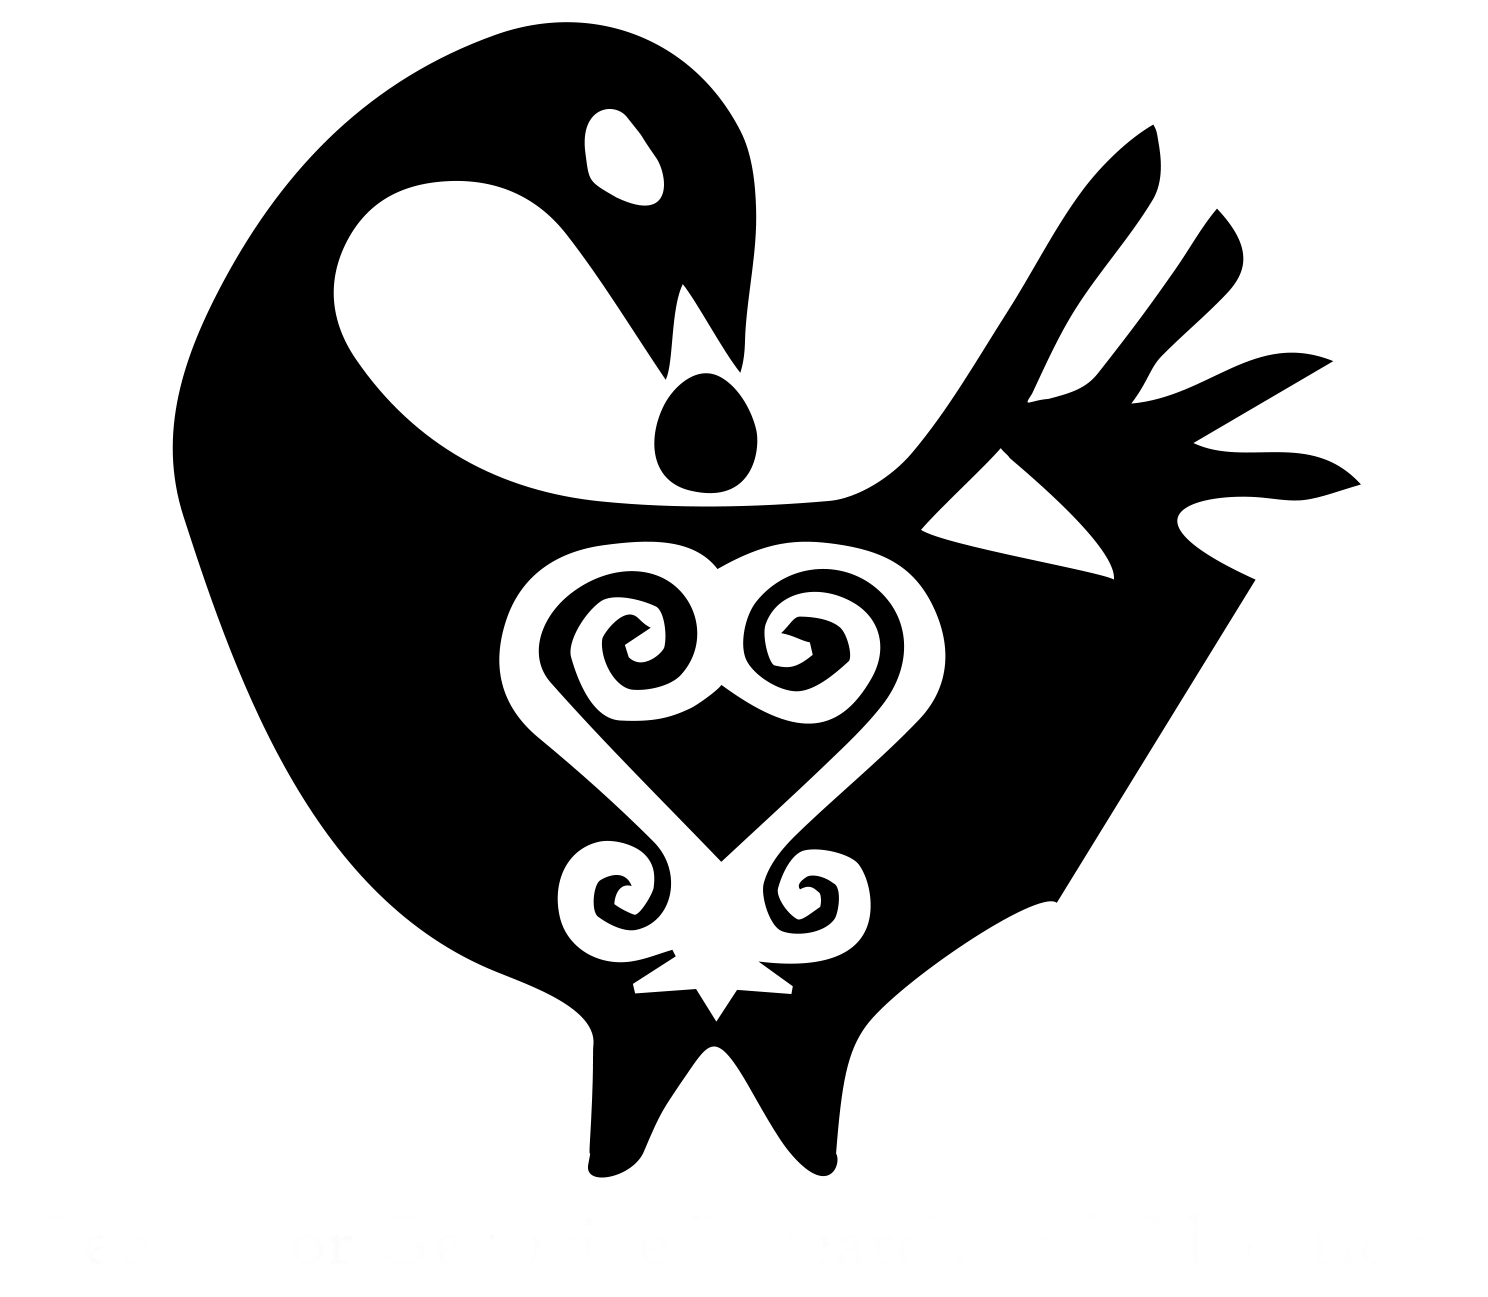 christi_logo_black.png